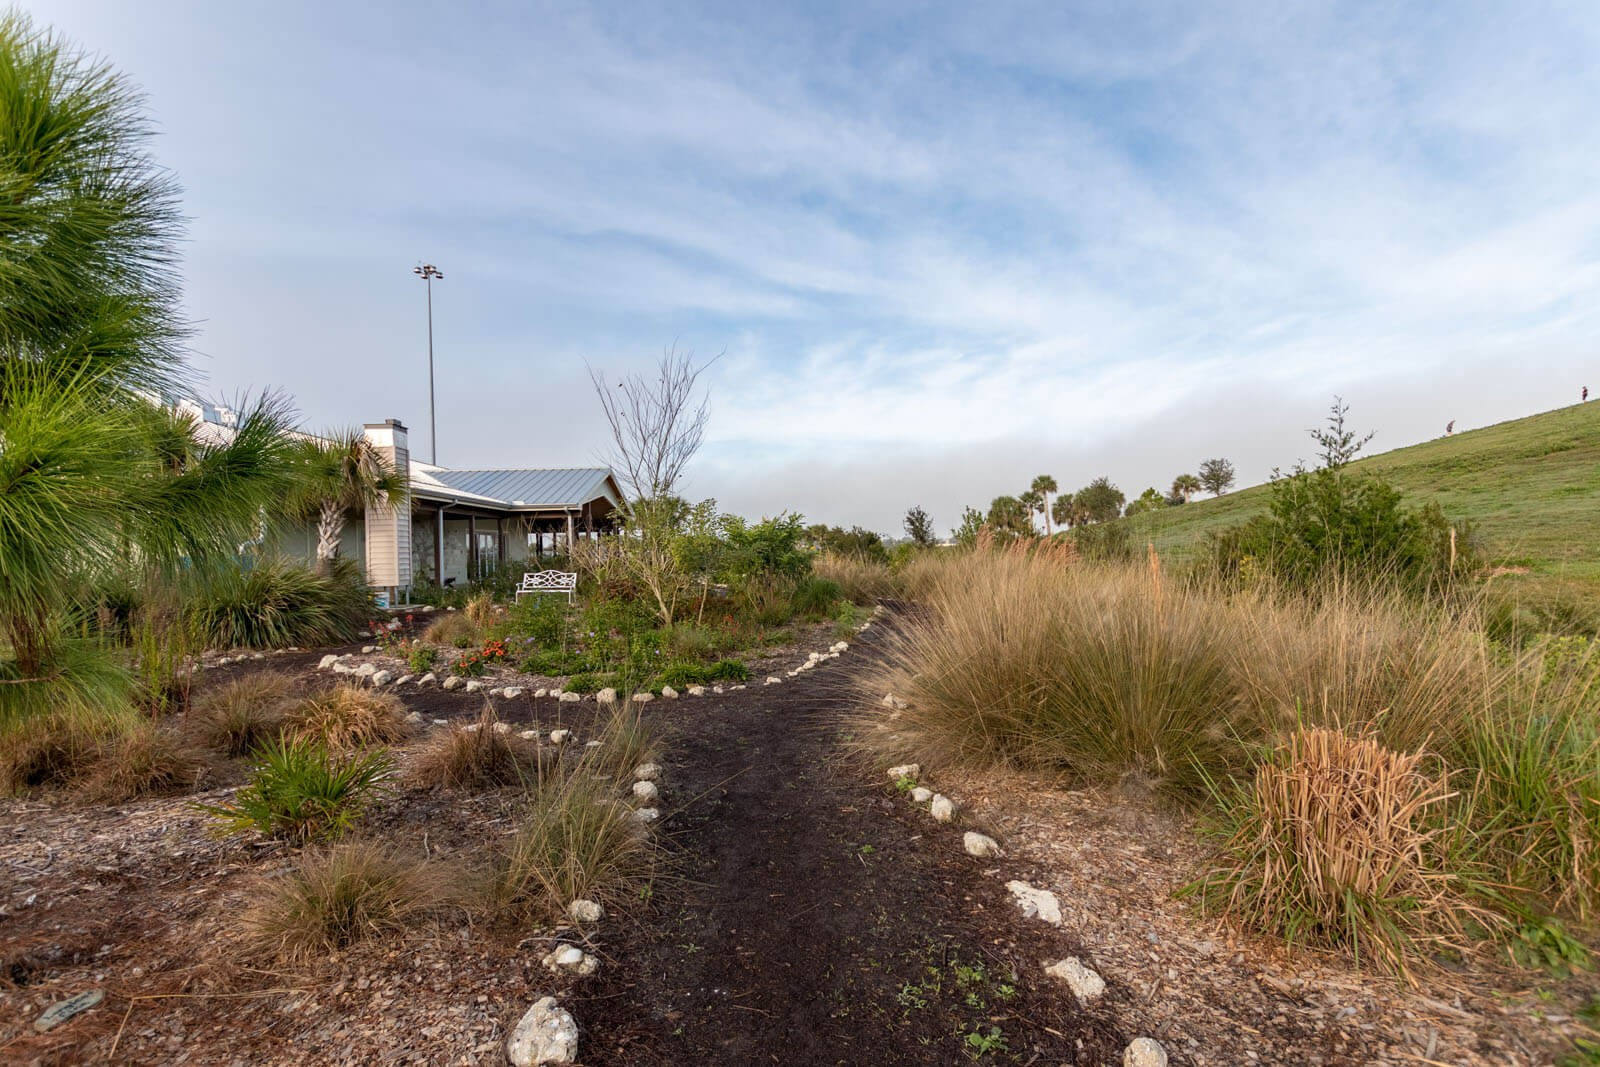 cardel-homes-tampa-worthington-community-photos-23.jpg